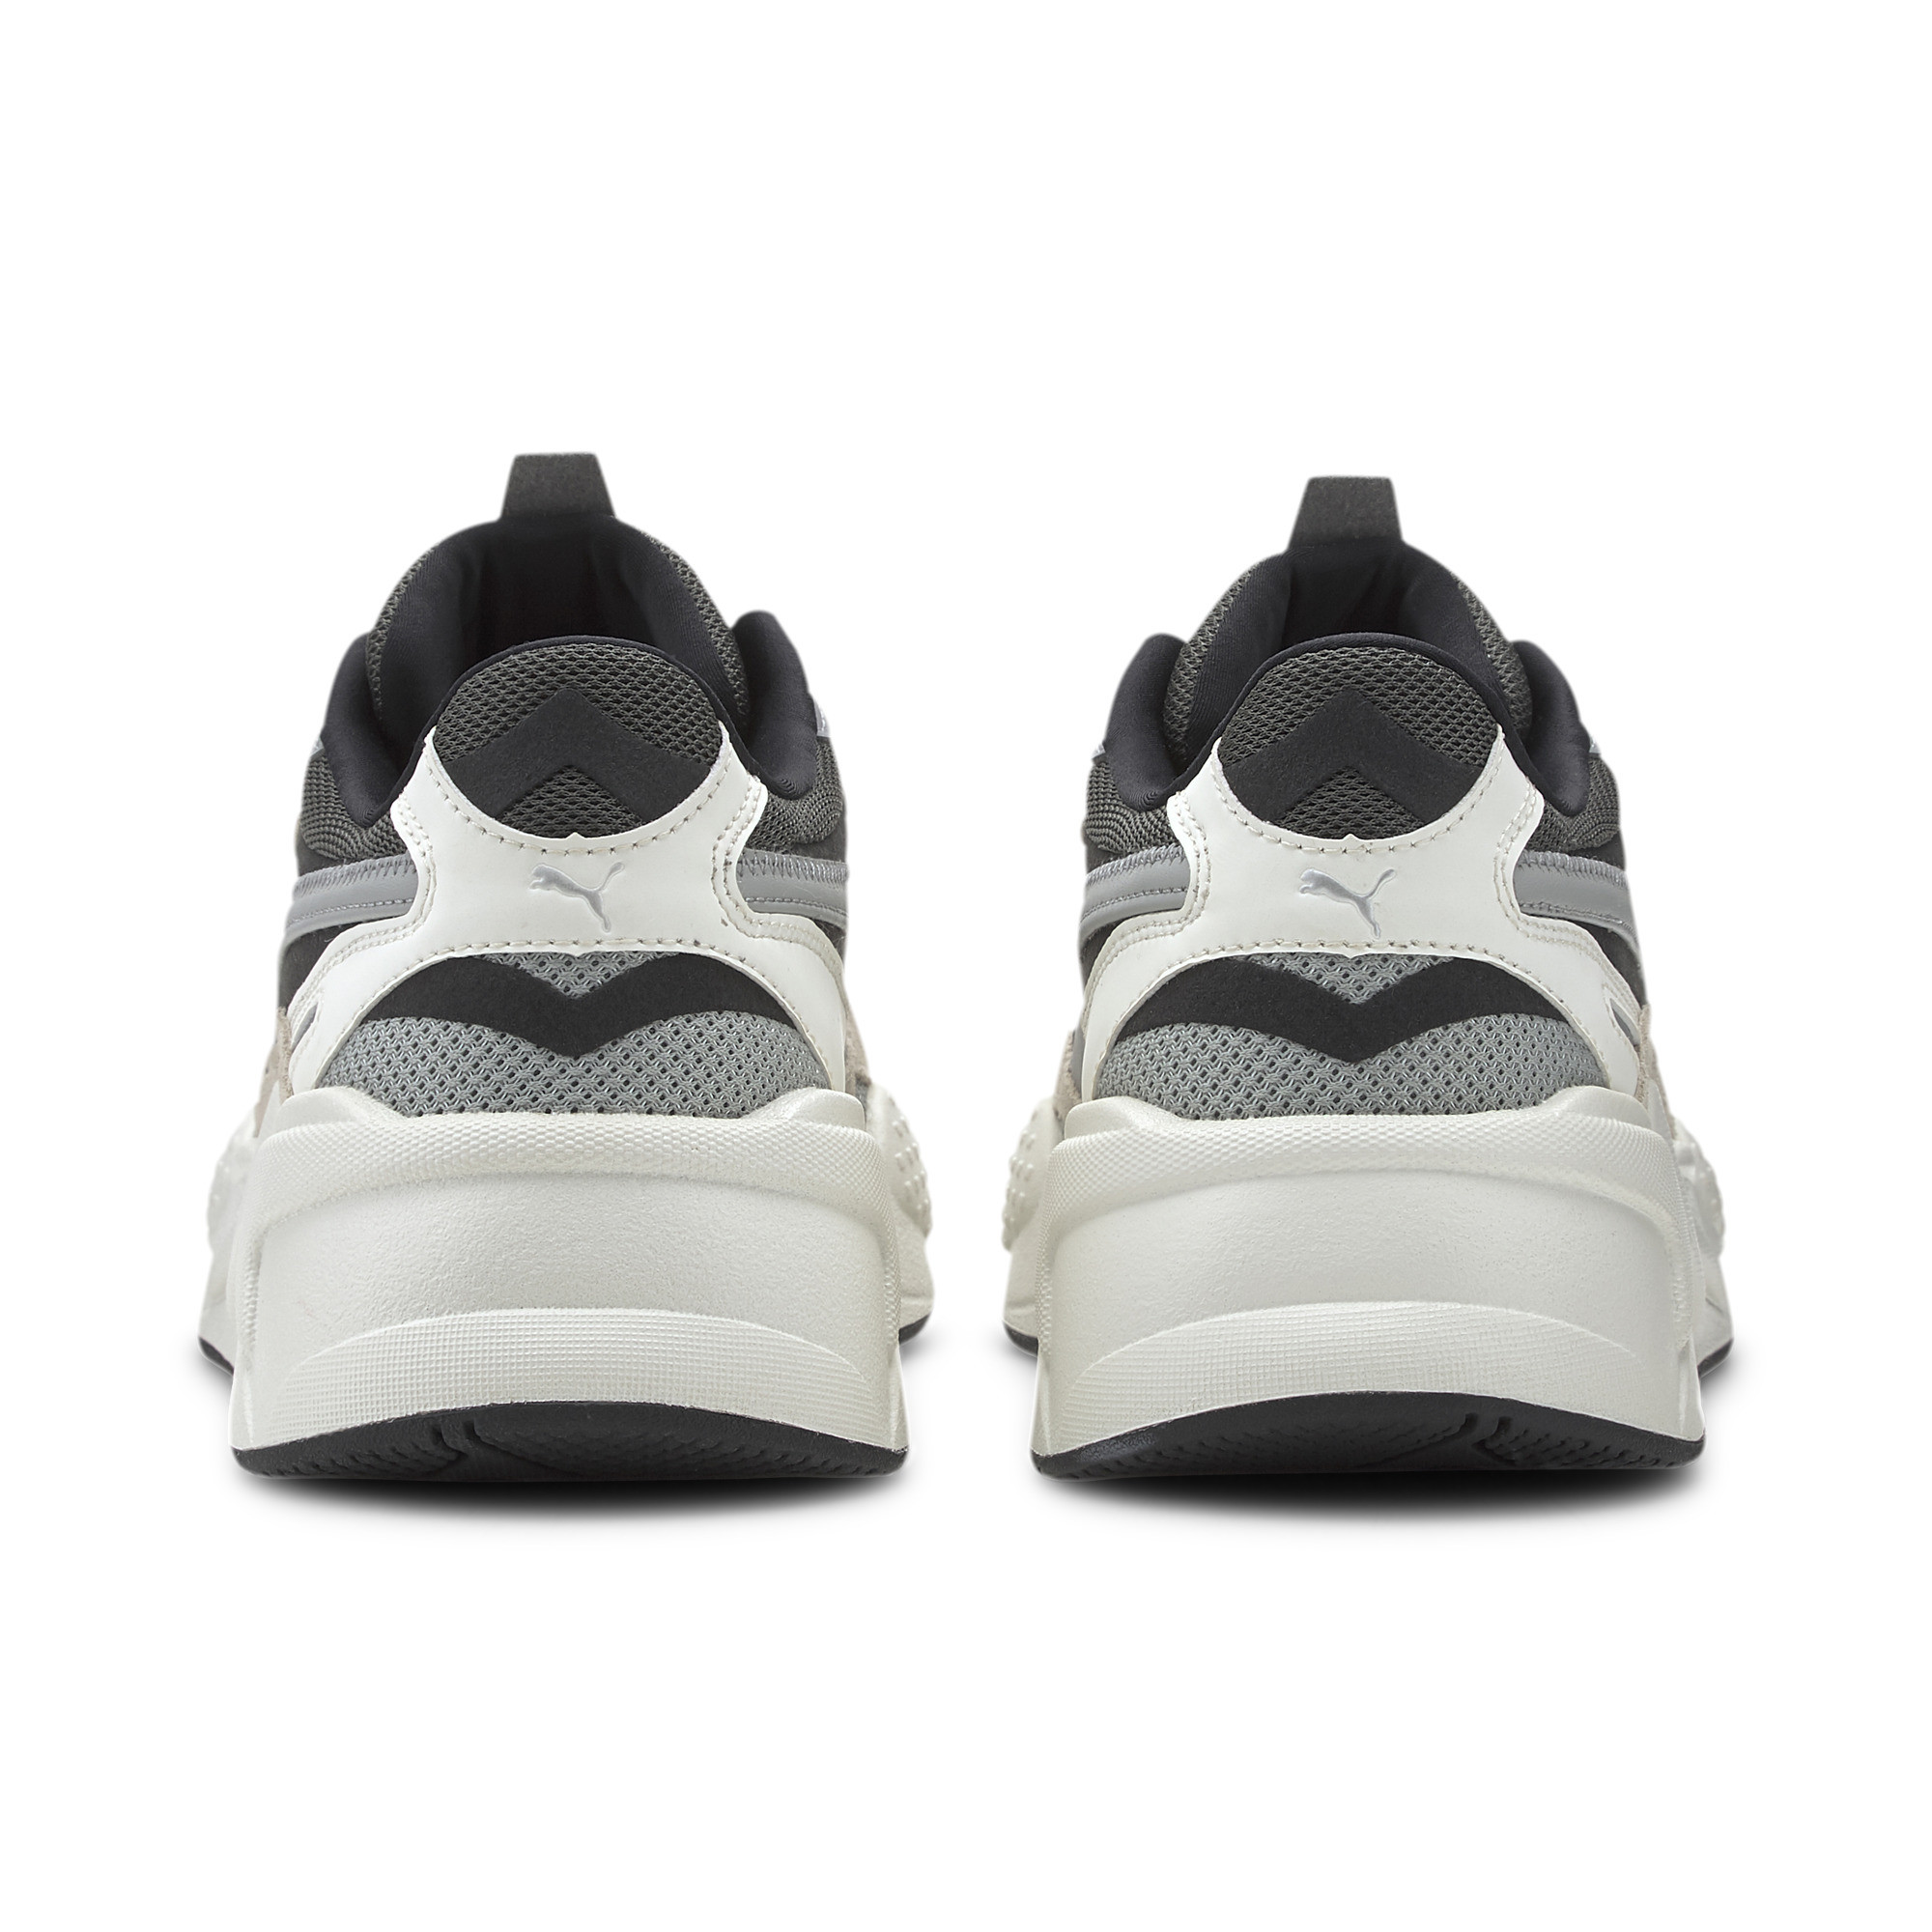 PUMA-Men-039-s-RS-X-Puzzle-Sneakers thumbnail 10